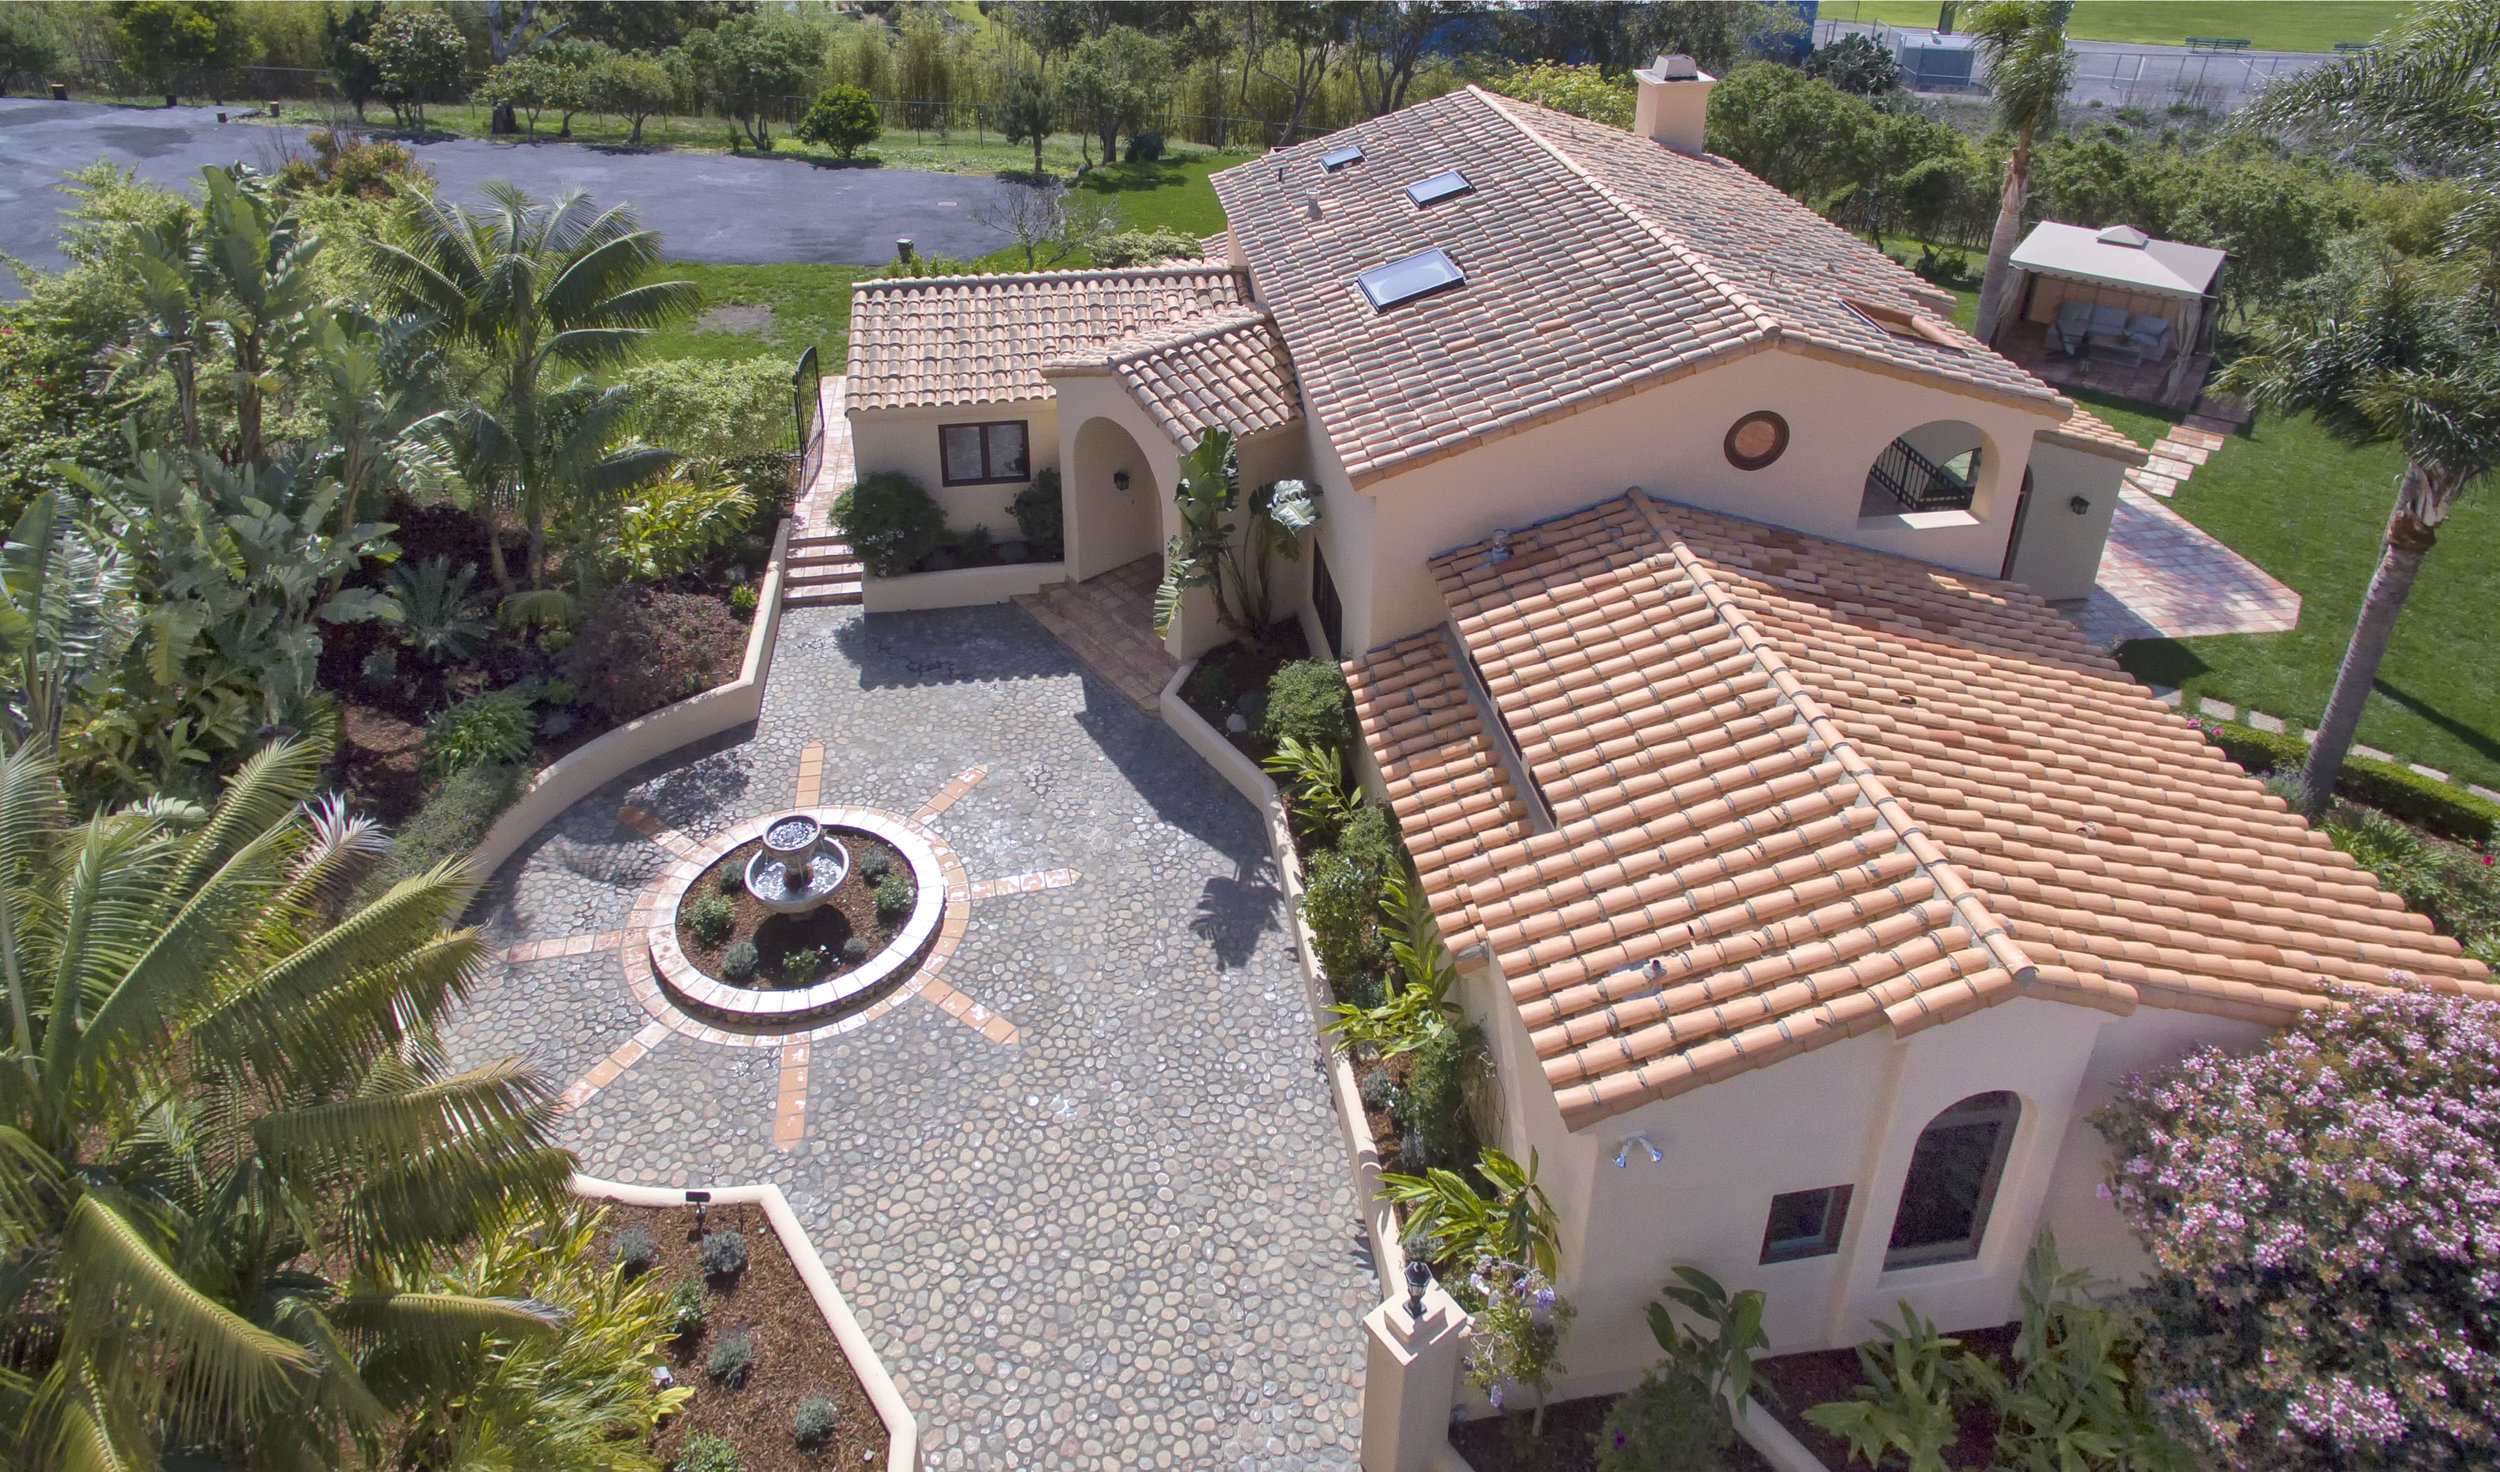 019 Front.6130 Via Cabrillo For Sale Lease The Malibu Life Team Luxury Real Estate.jpg